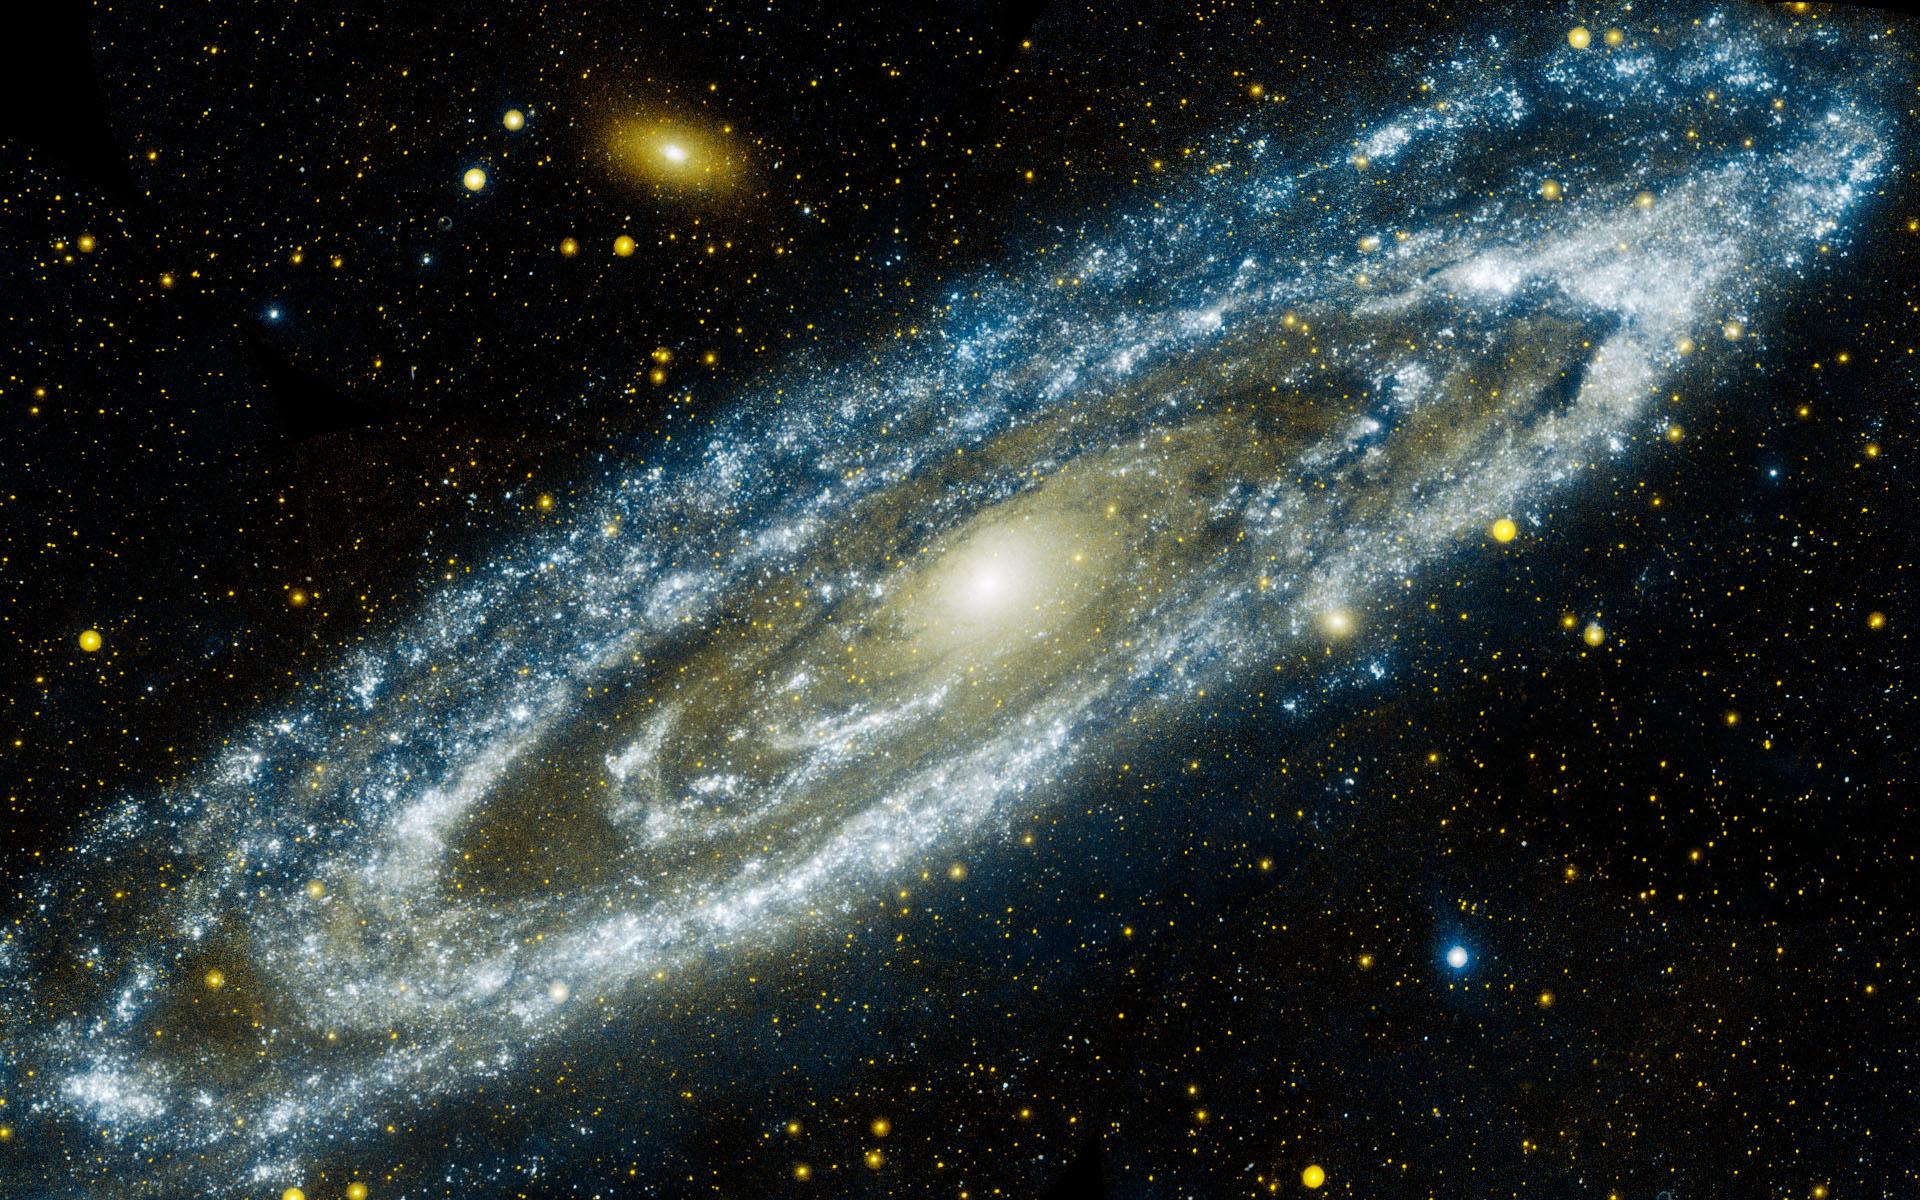 Andromeda Galaxy fond ecran hd 1920x1200